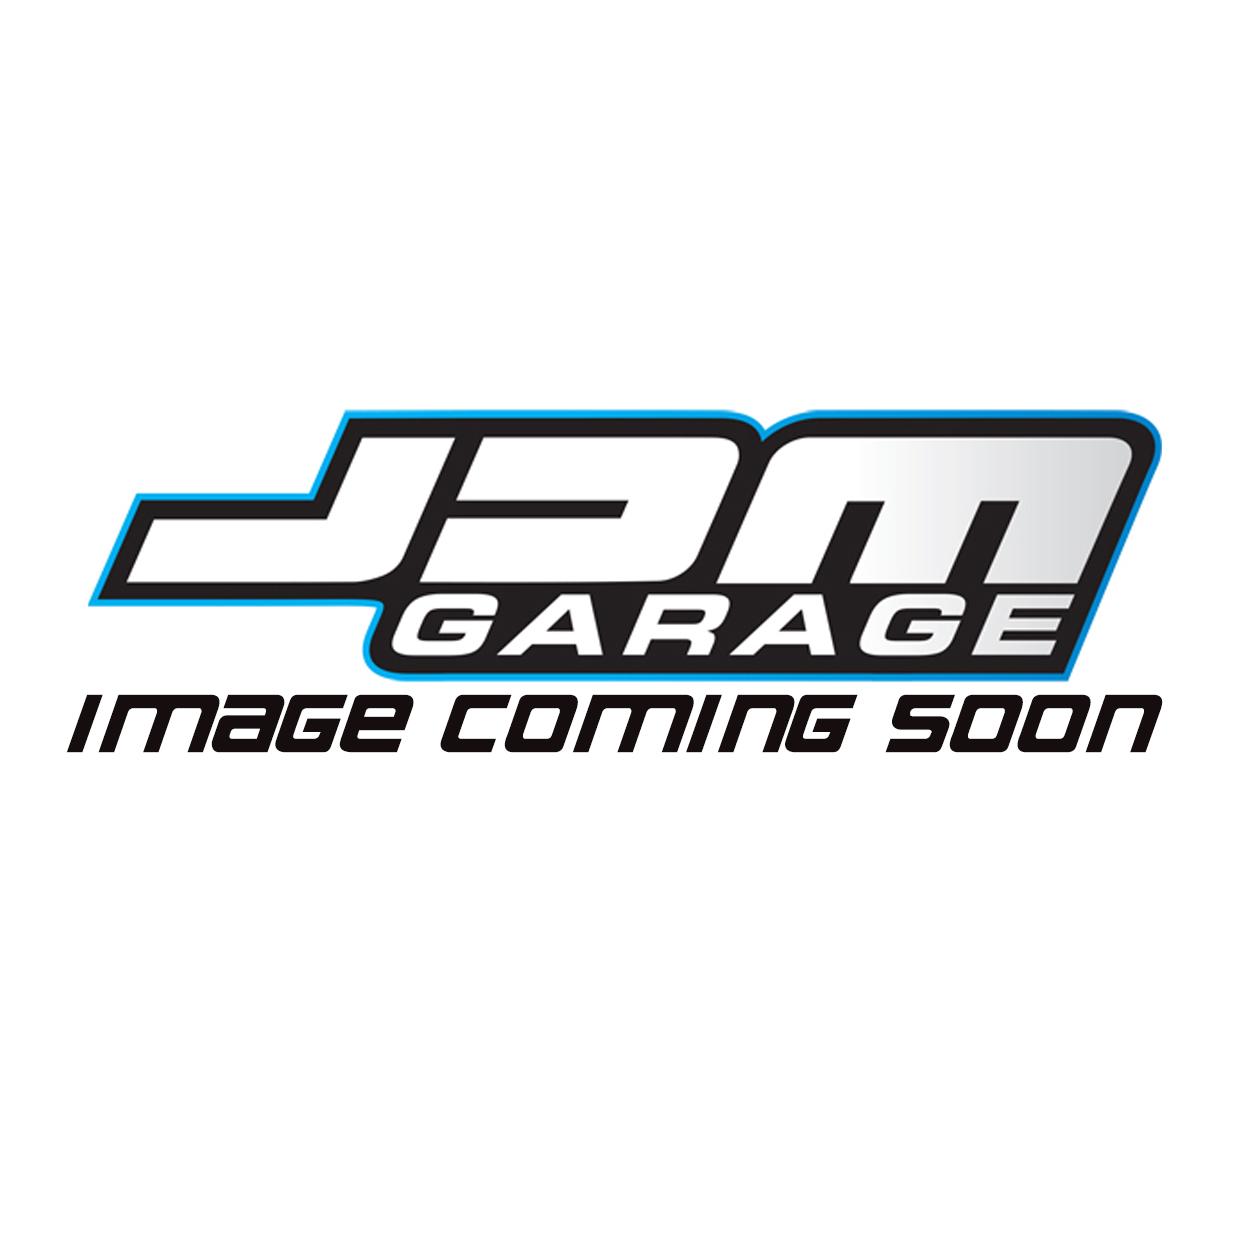 JDM Garage Logo Sticker - Gloss